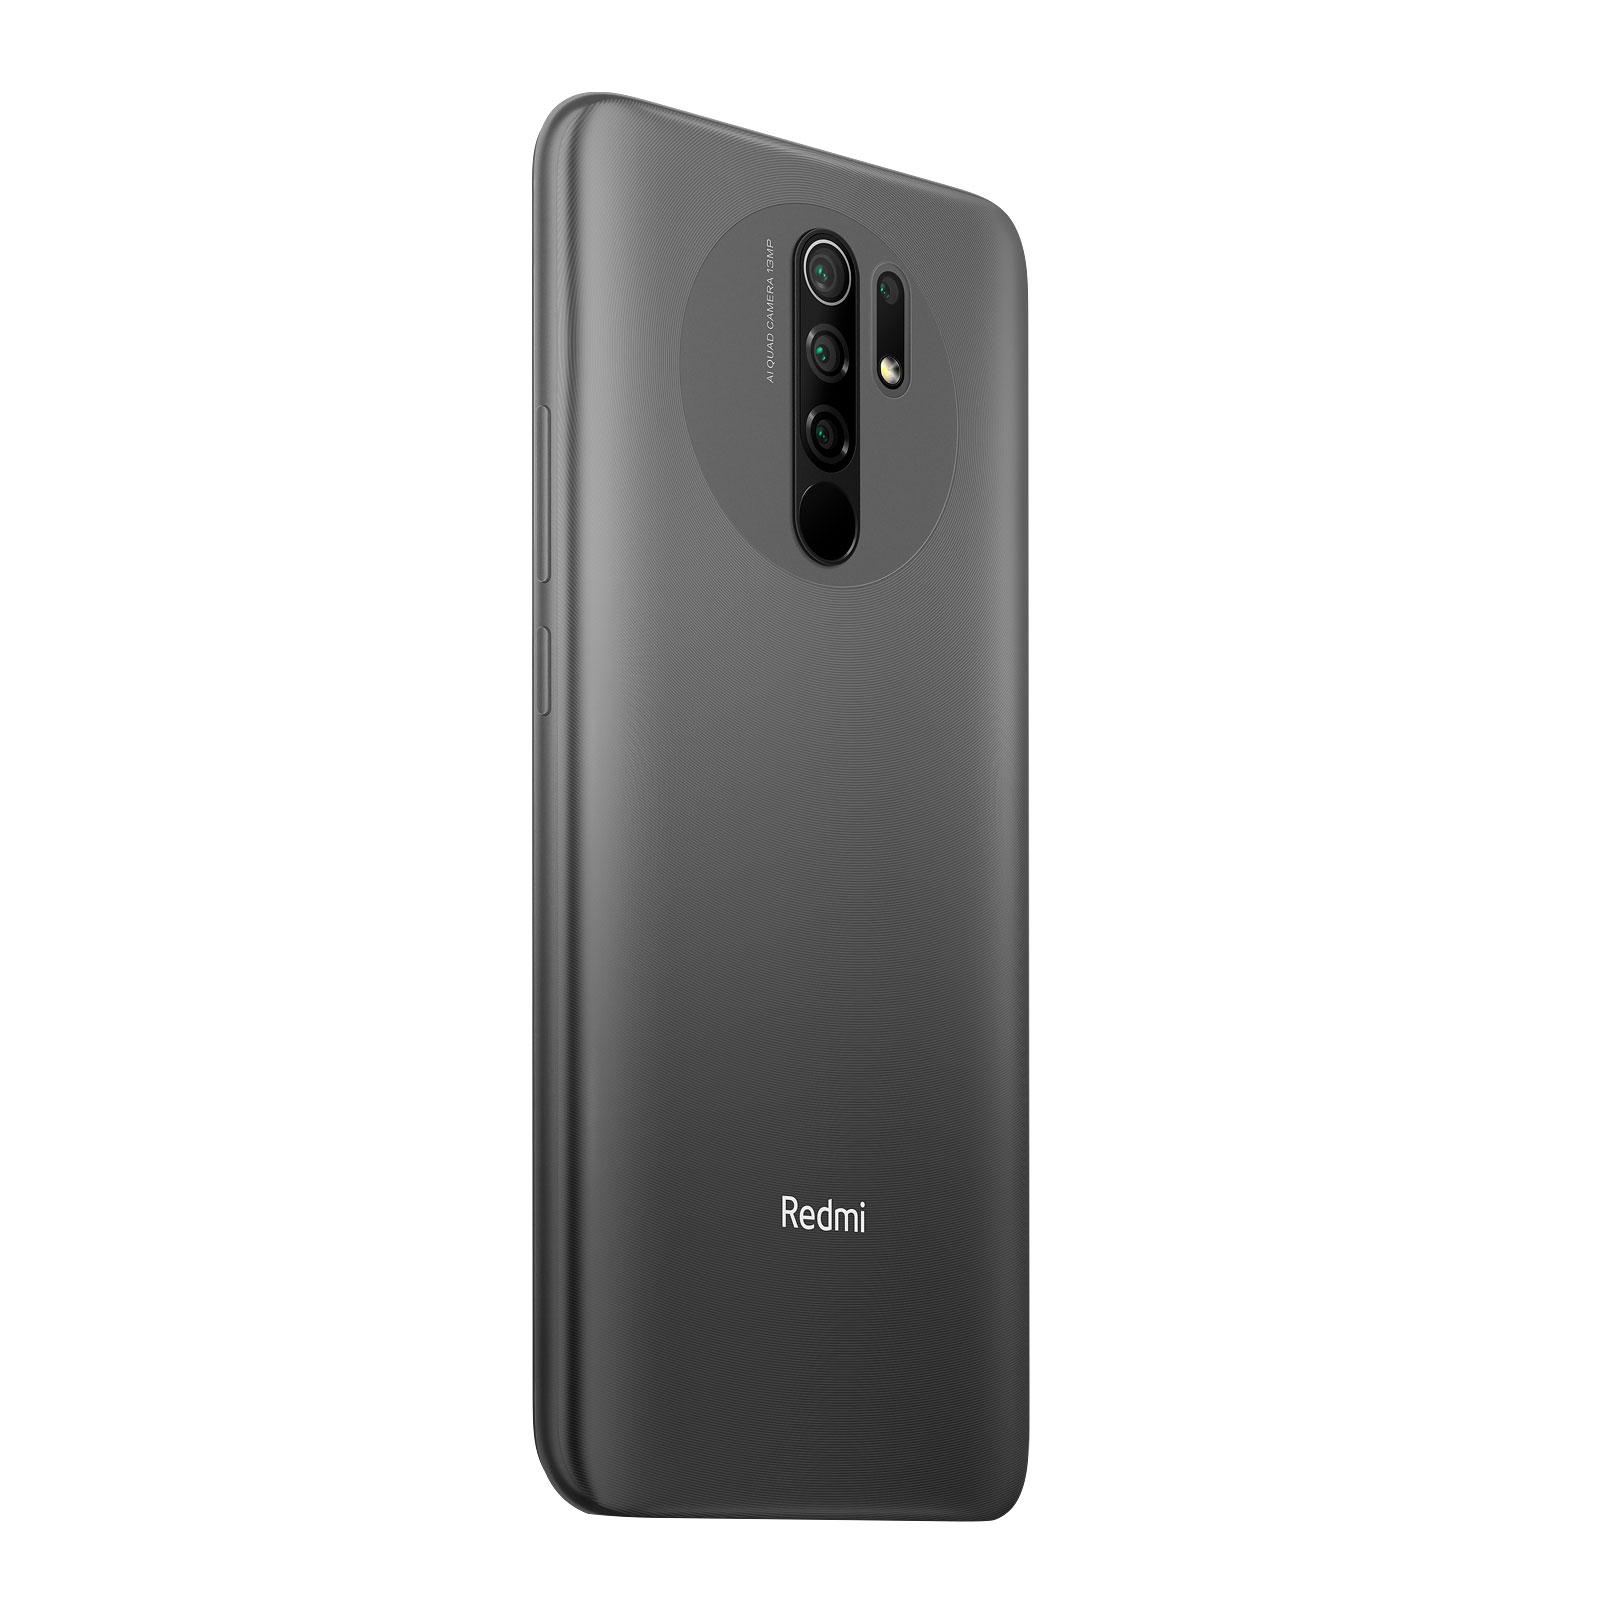 Redmi 9 - 3GB+32GB, Gris Carbono